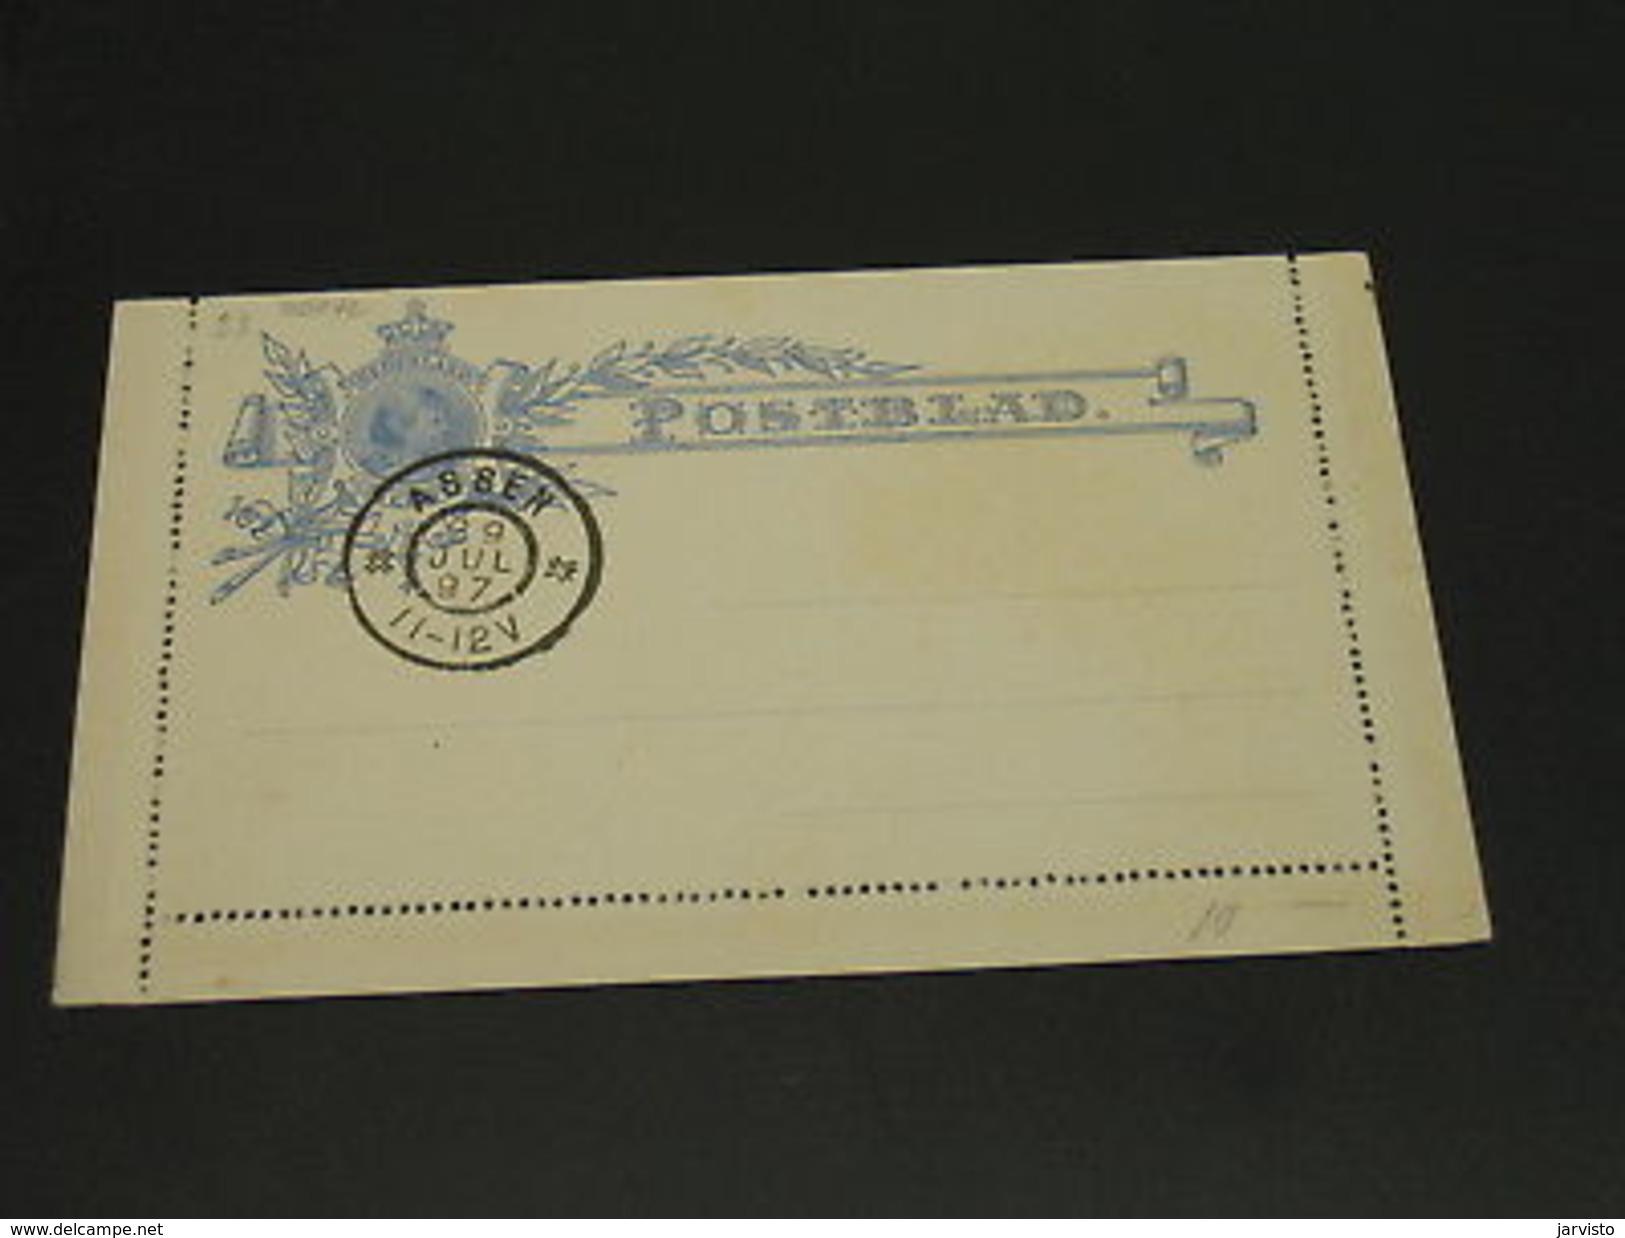 Netherlands 1897 Assen Letter Card *20242 - Netherlands